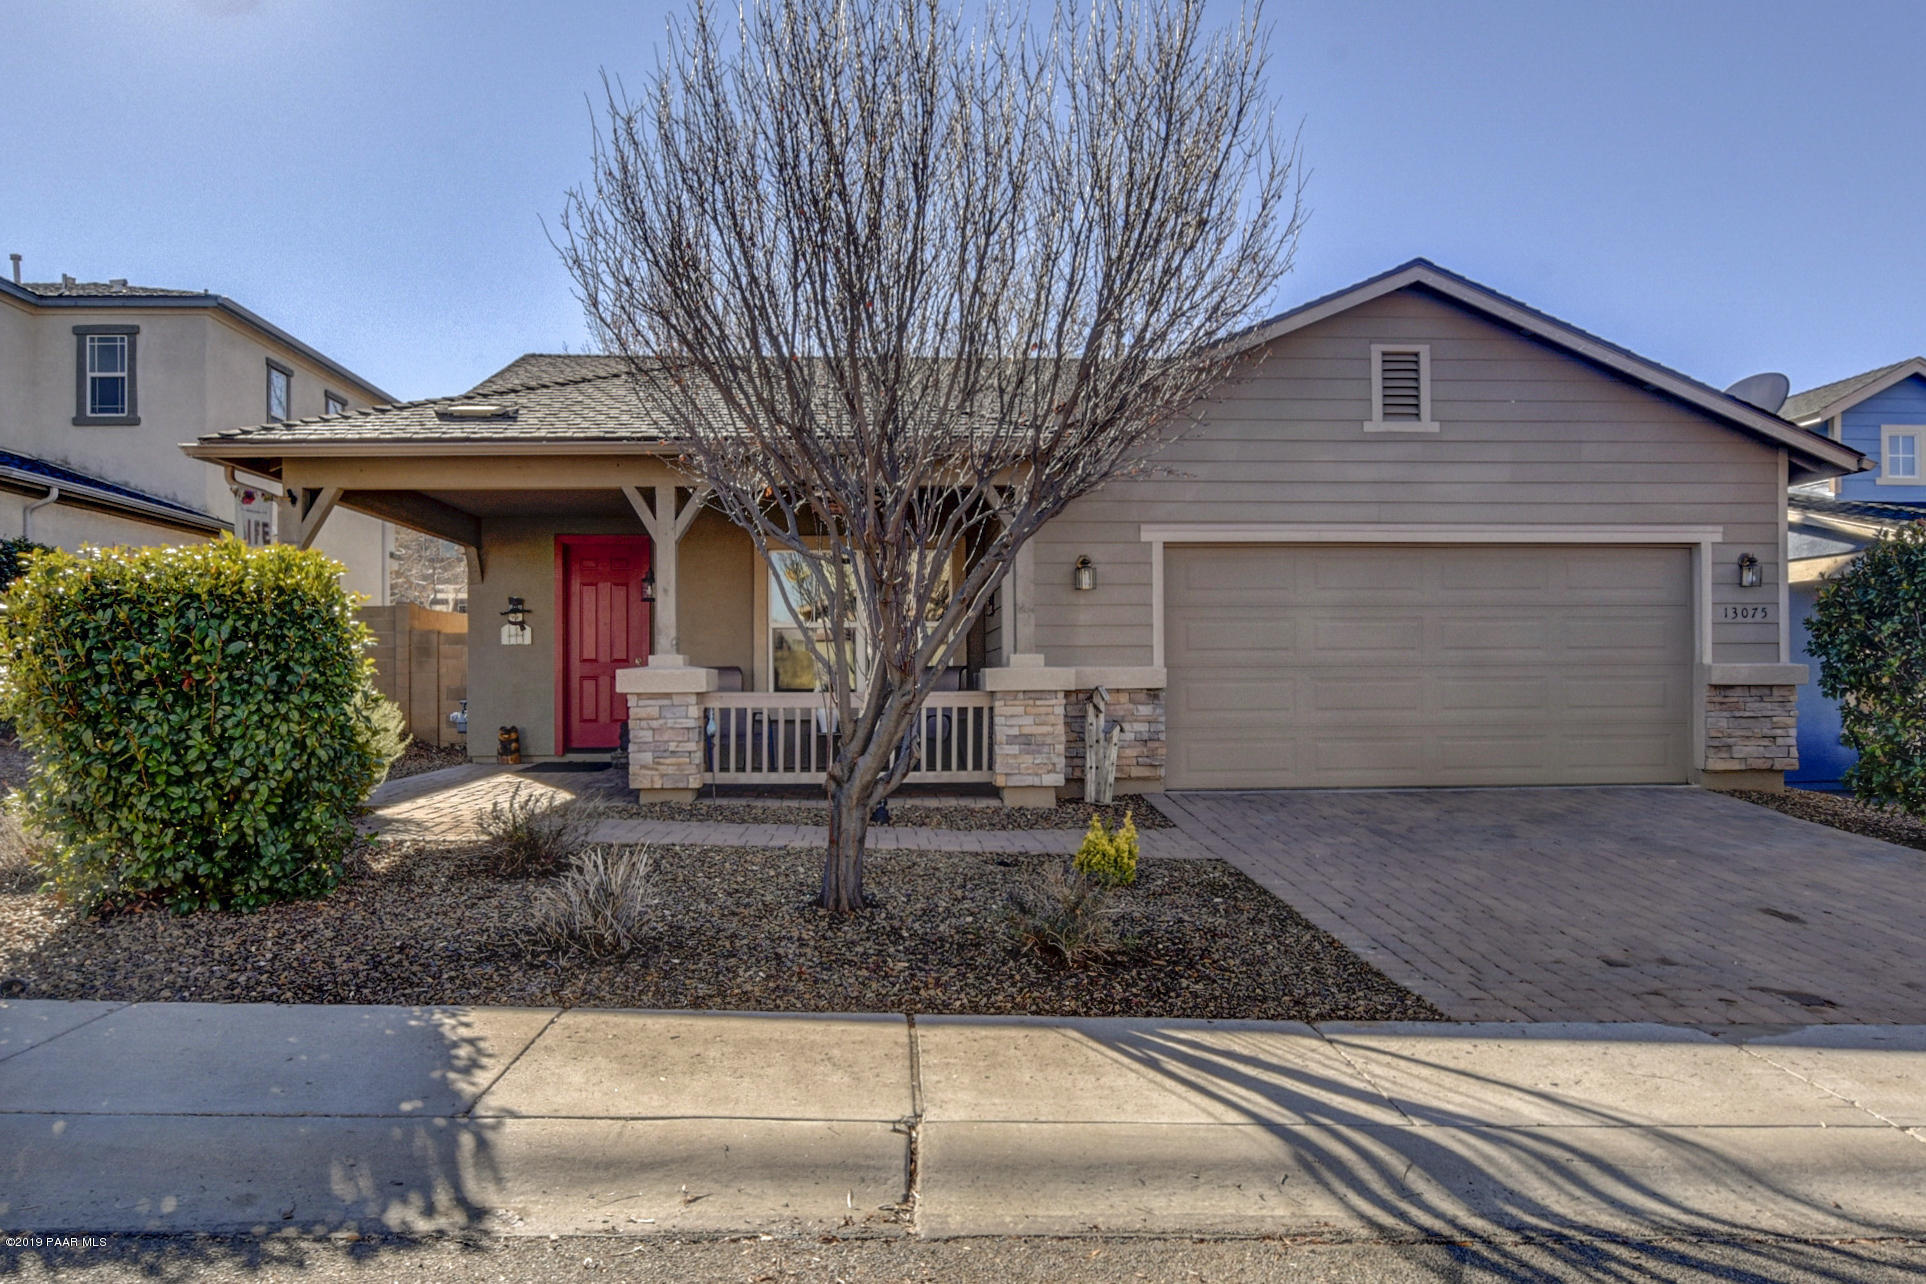 13075 E Durango Street, Prescott Valley in Yavapai County, AZ 86327 Home for Sale